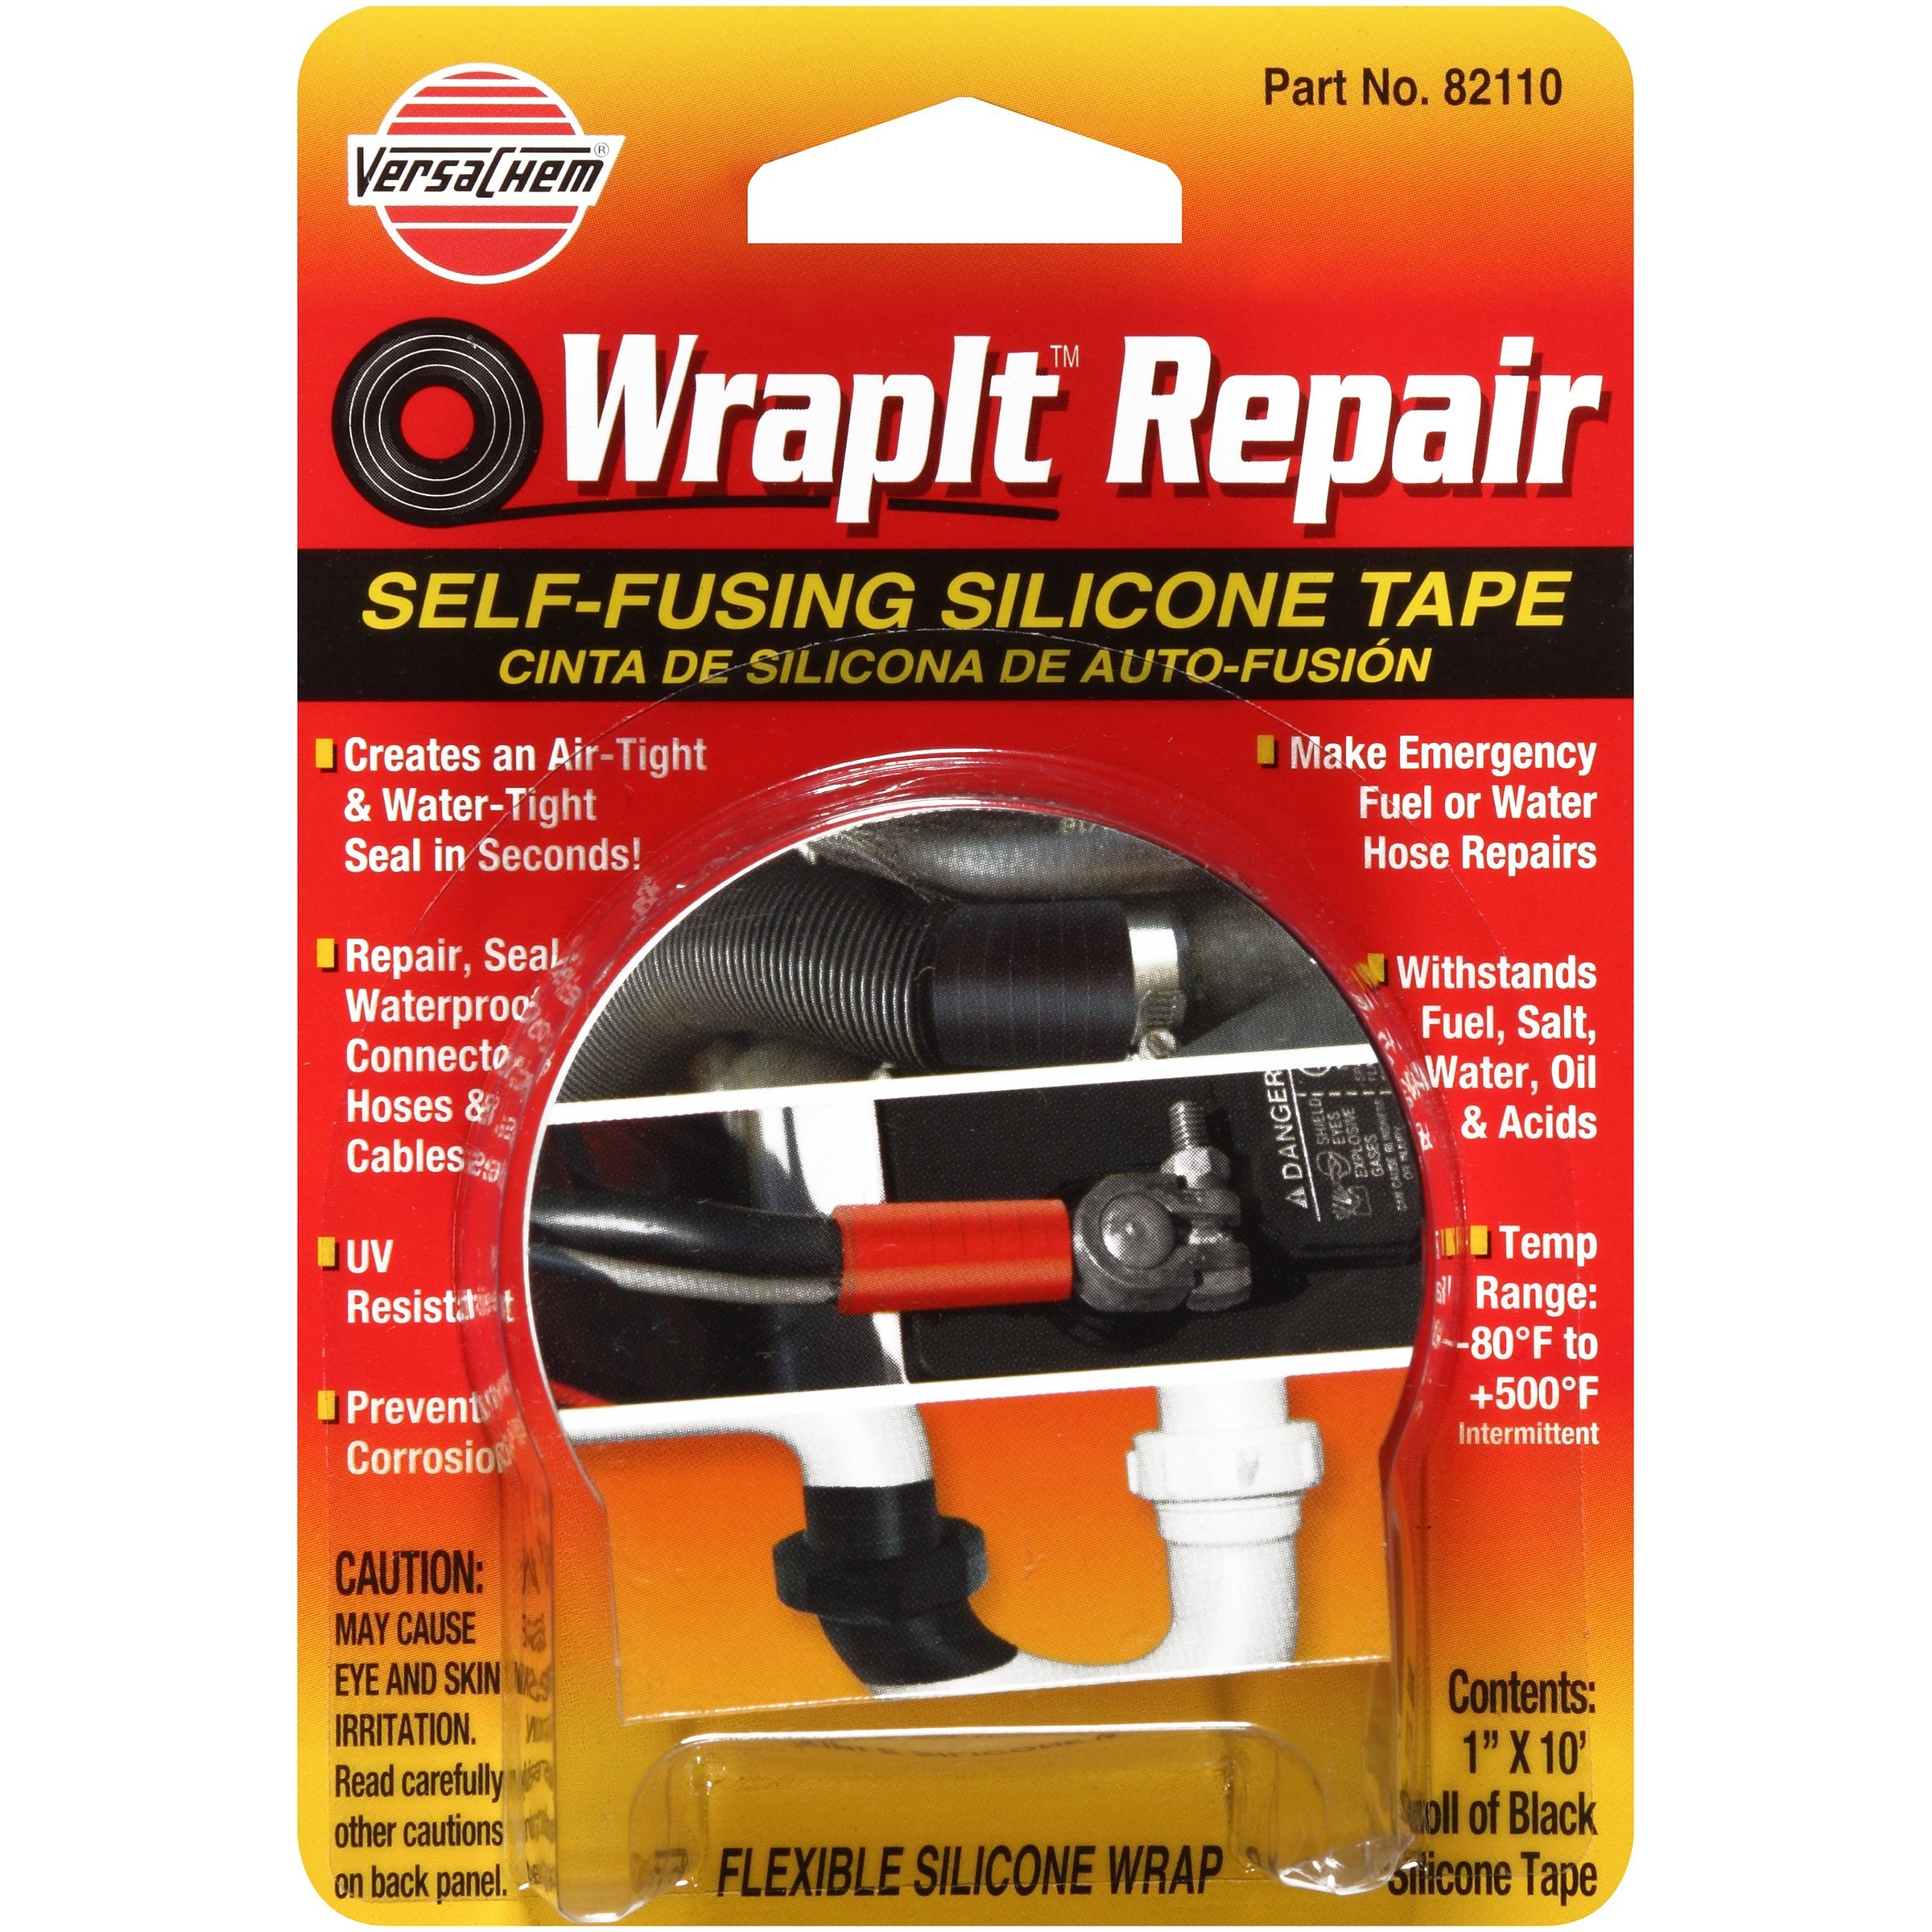 Versachem 82110 WrapIt 1'' x 10' Repair Silicone Tape